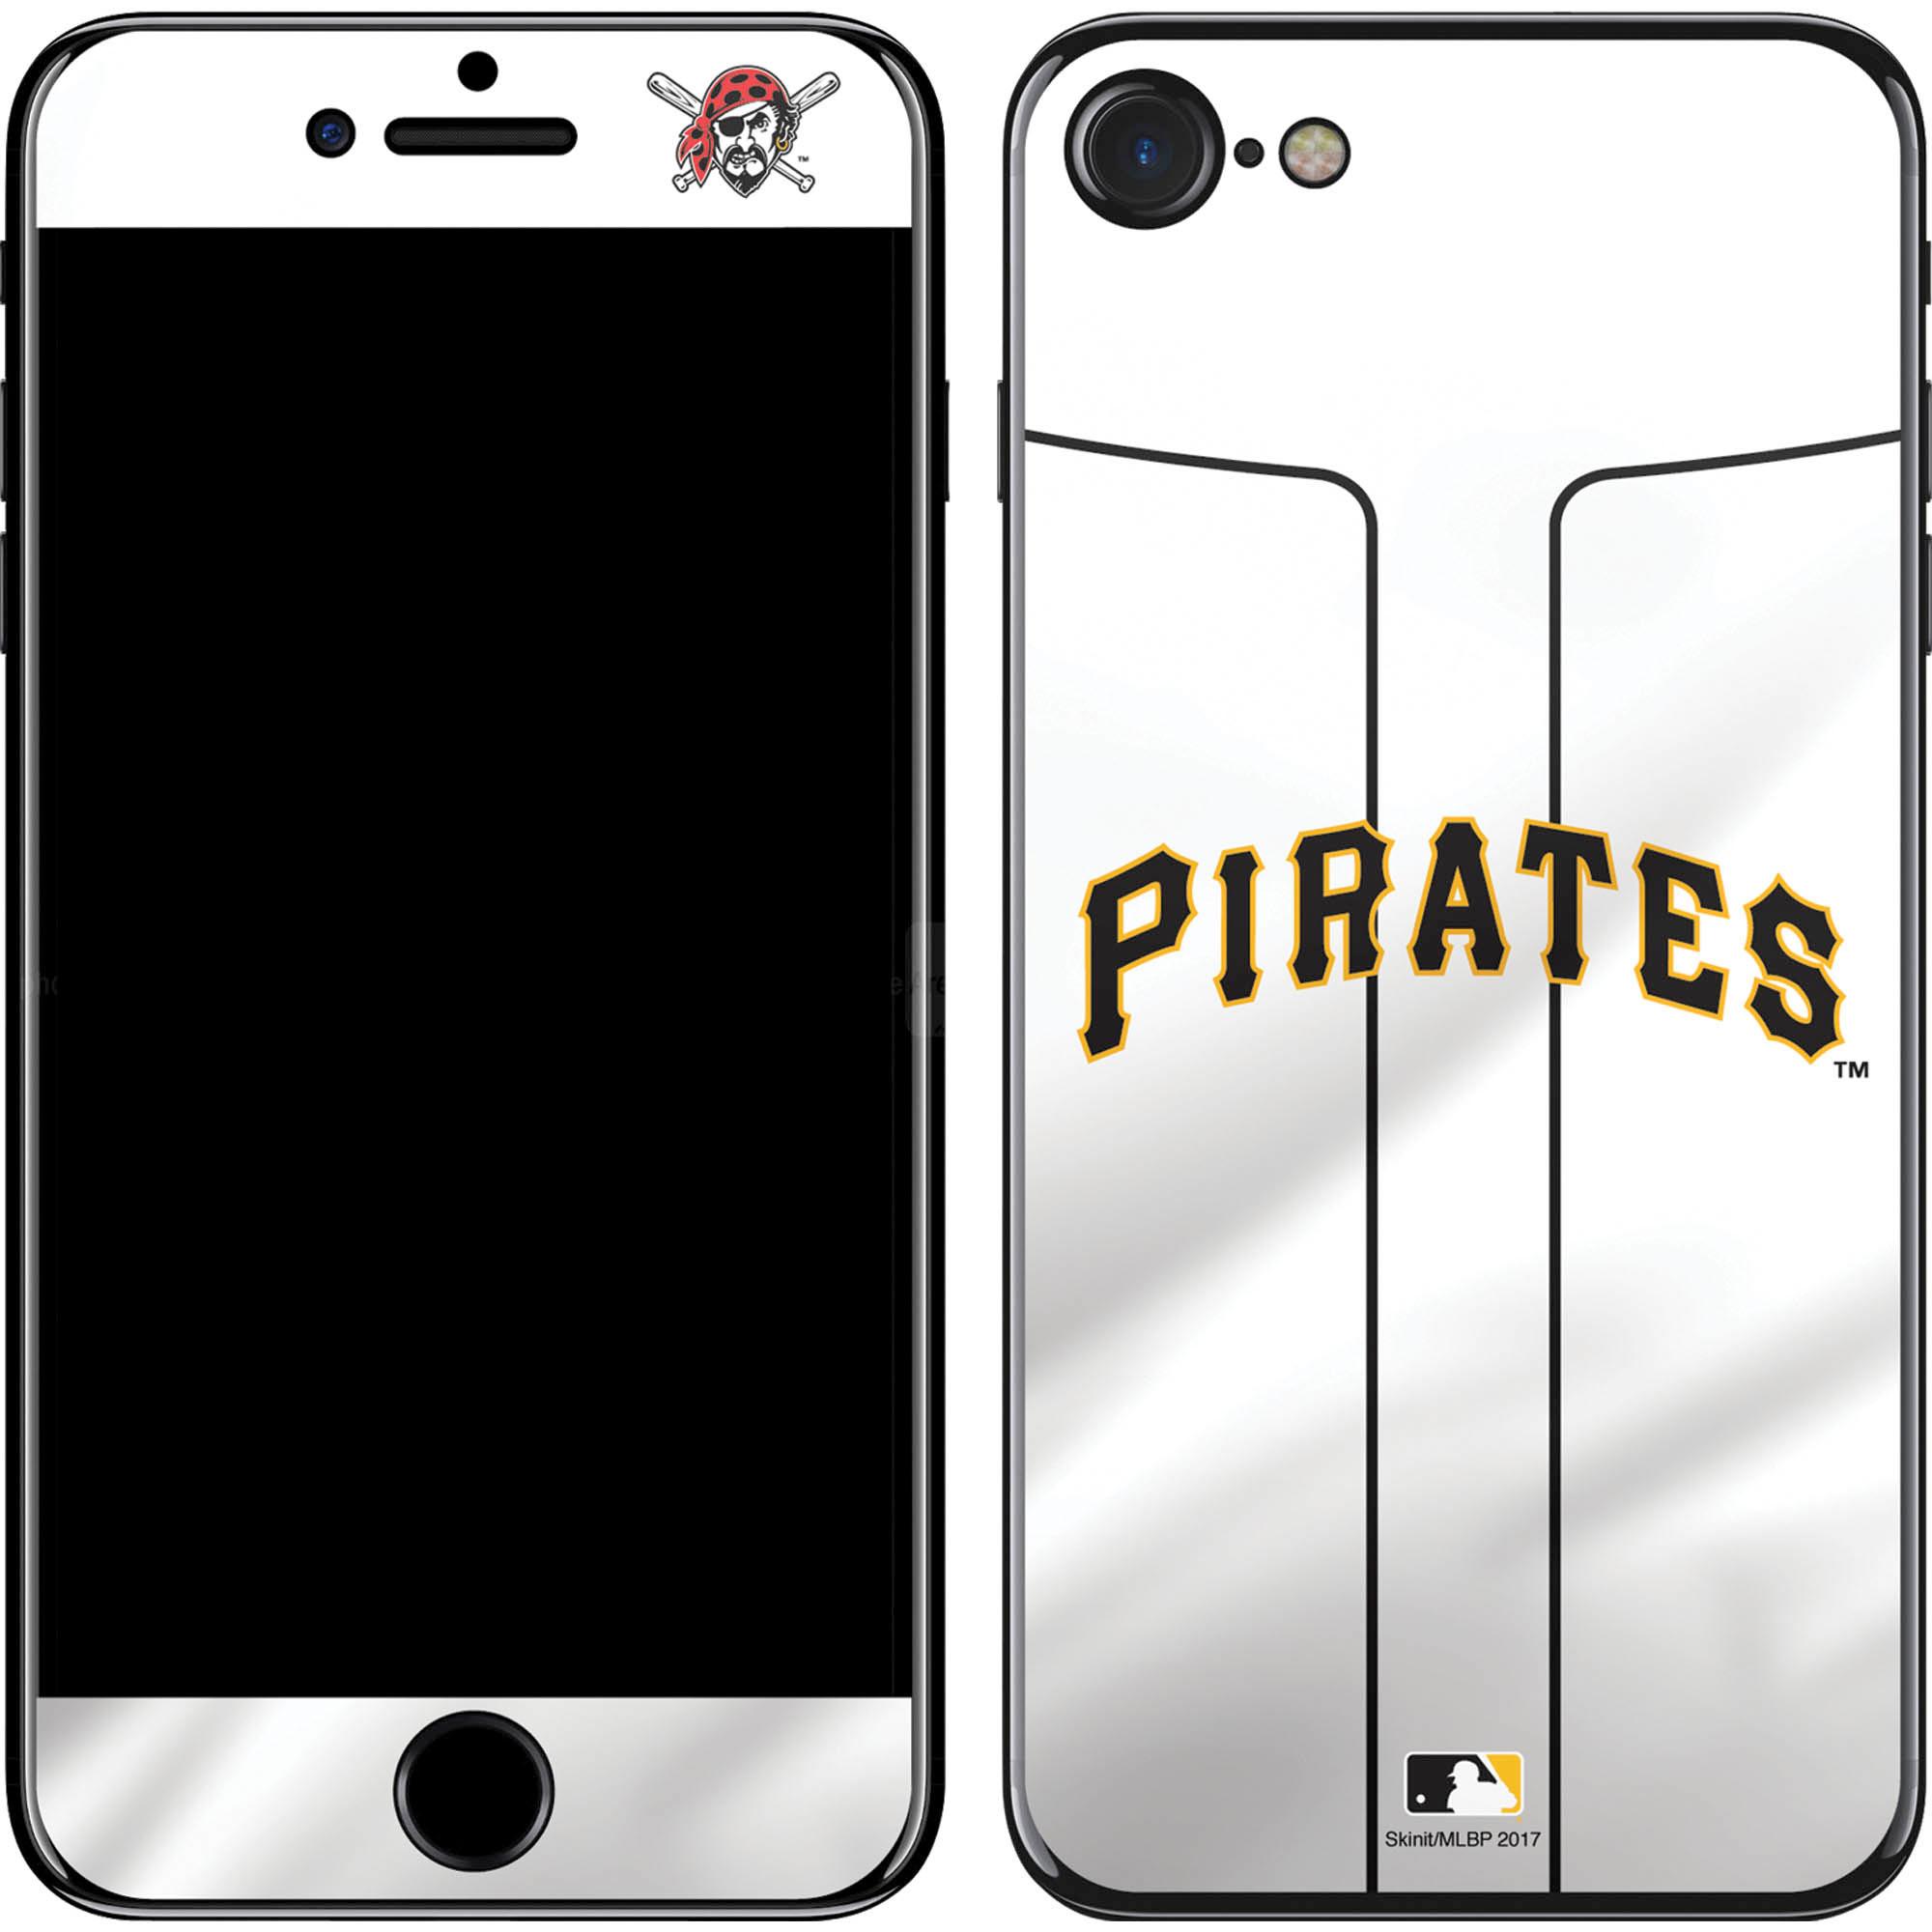 Pittsburgh Pirates Skinit iPhone 7 Skin - No Size